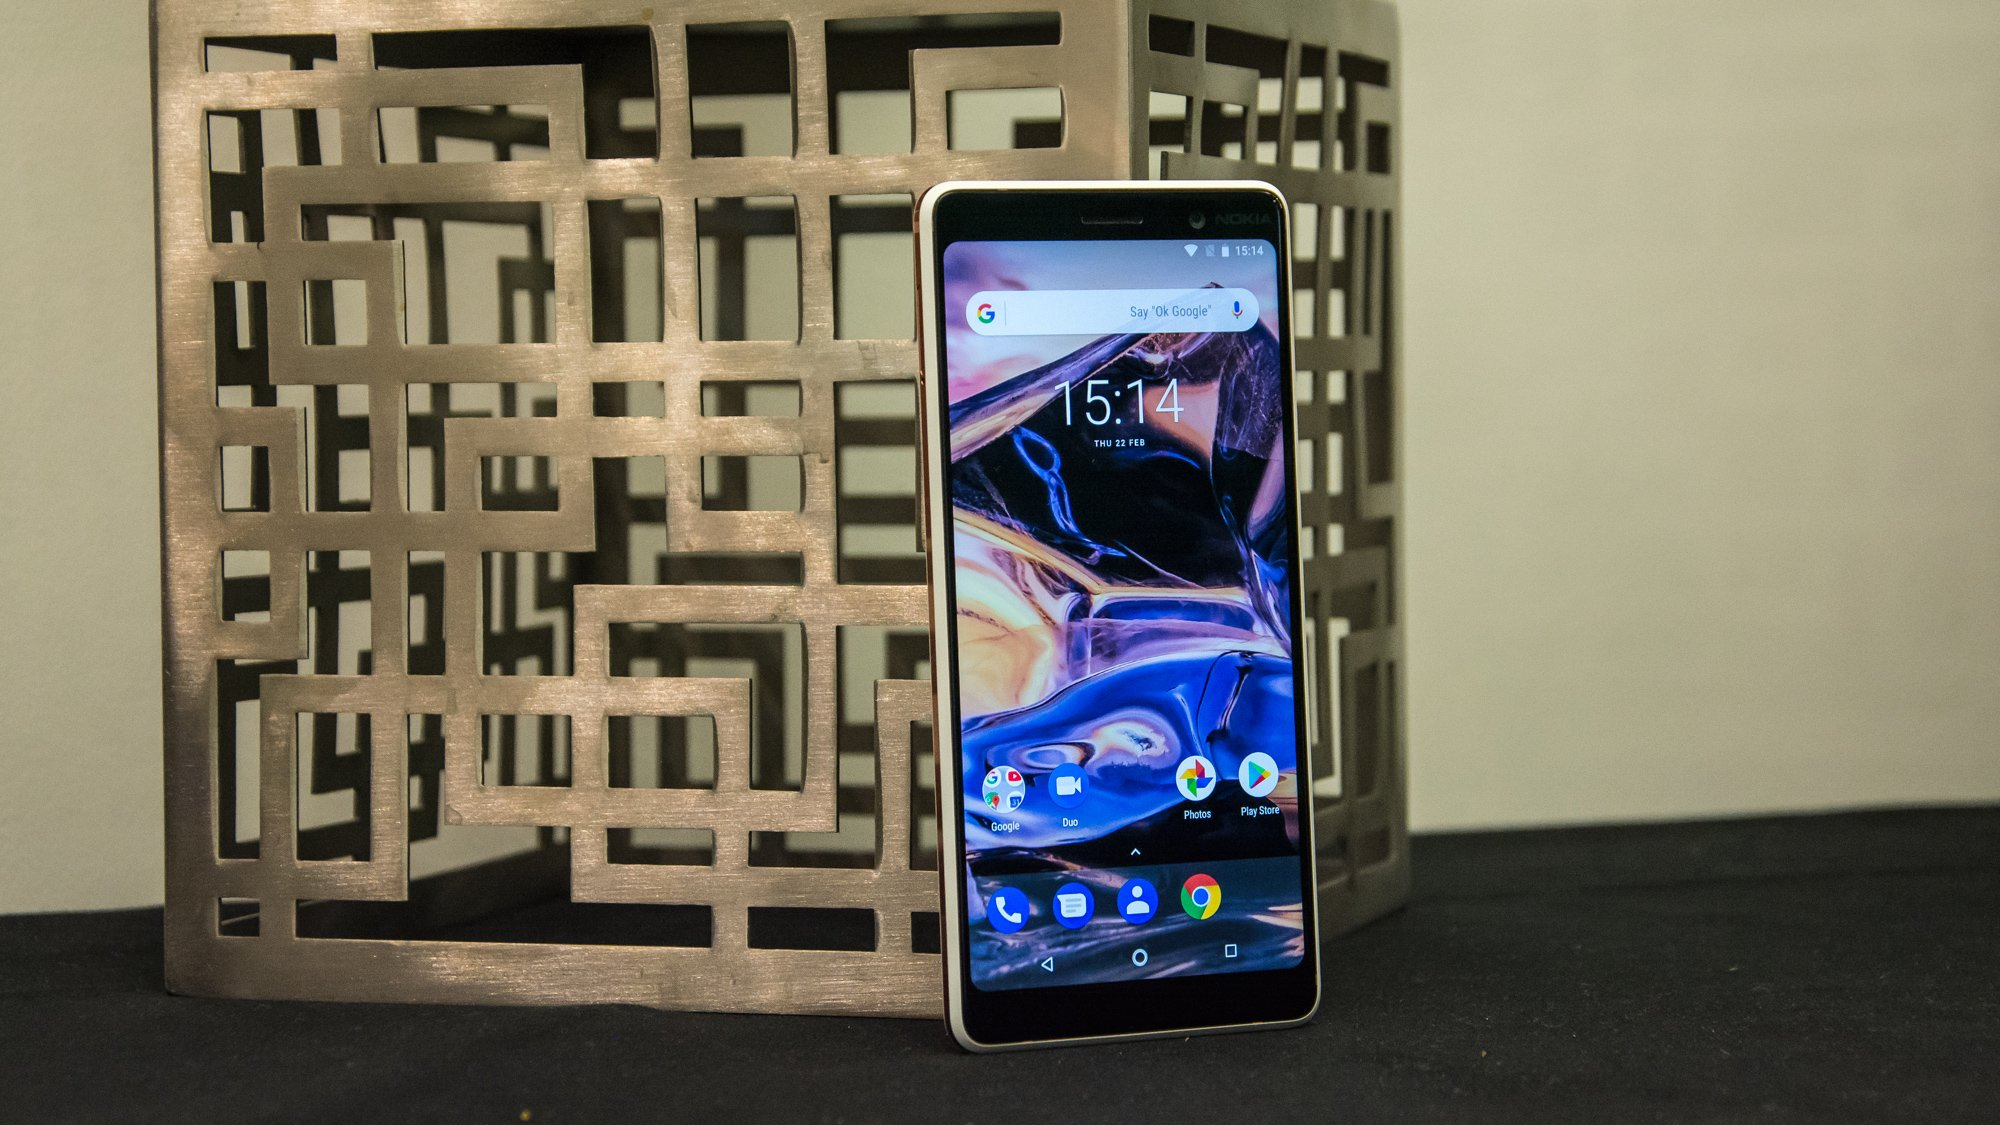 Meet Nokia 8 Sirocco: an Ultra-Compact Powerhouse for the Fans